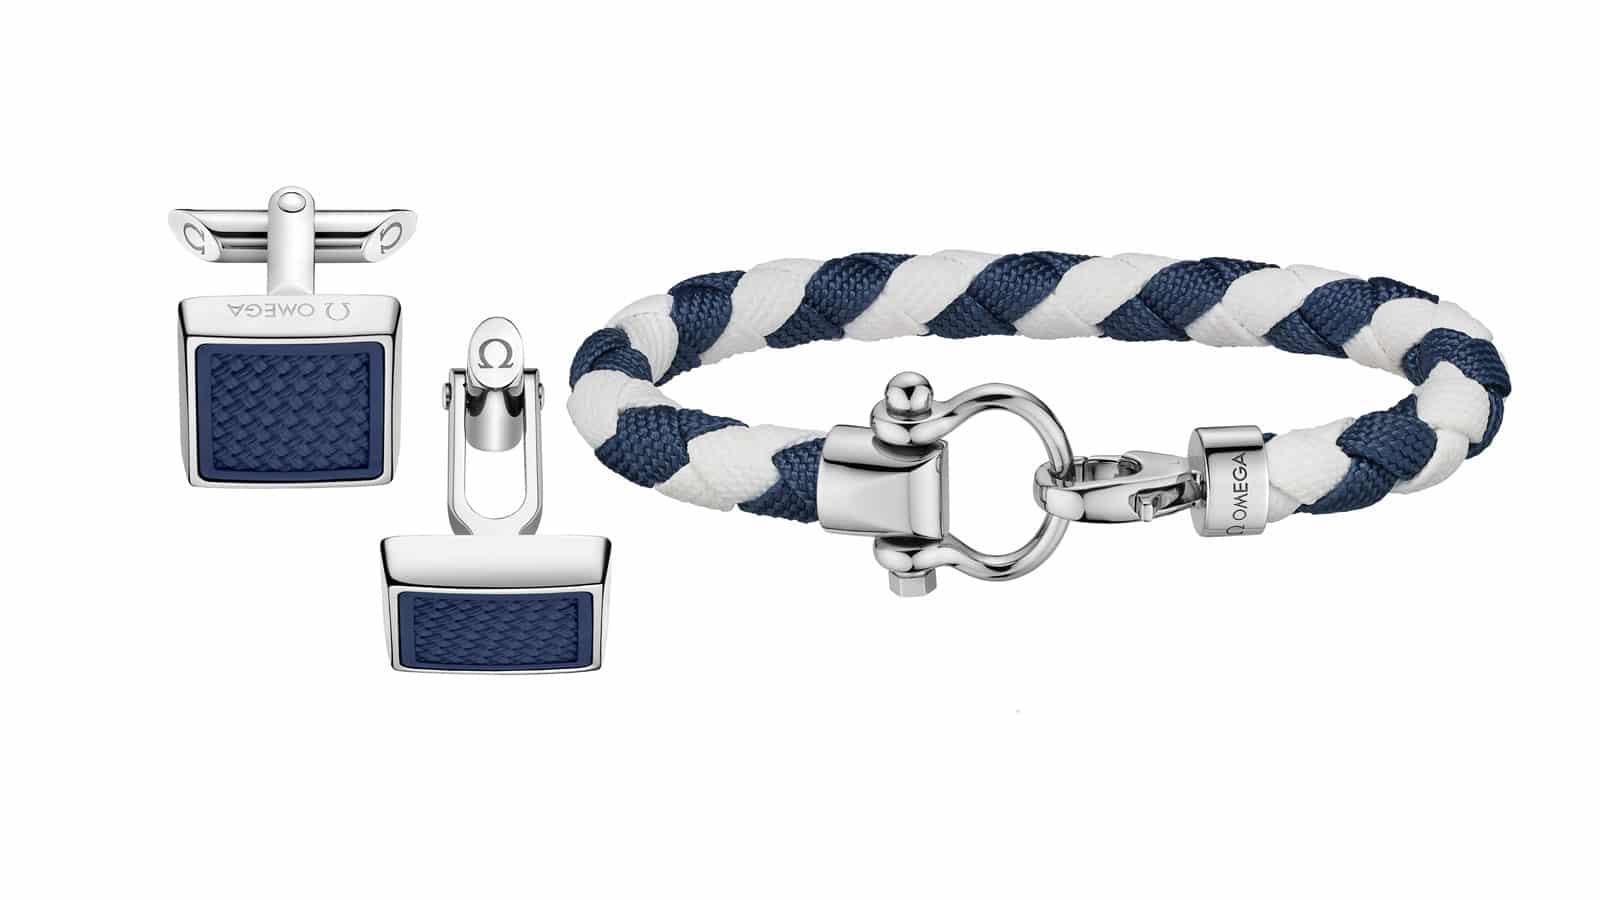 Omega-bracelet-sailing-boutons-de-manchettes-lionel-meylan-horlogerie-joaillerie-vevey